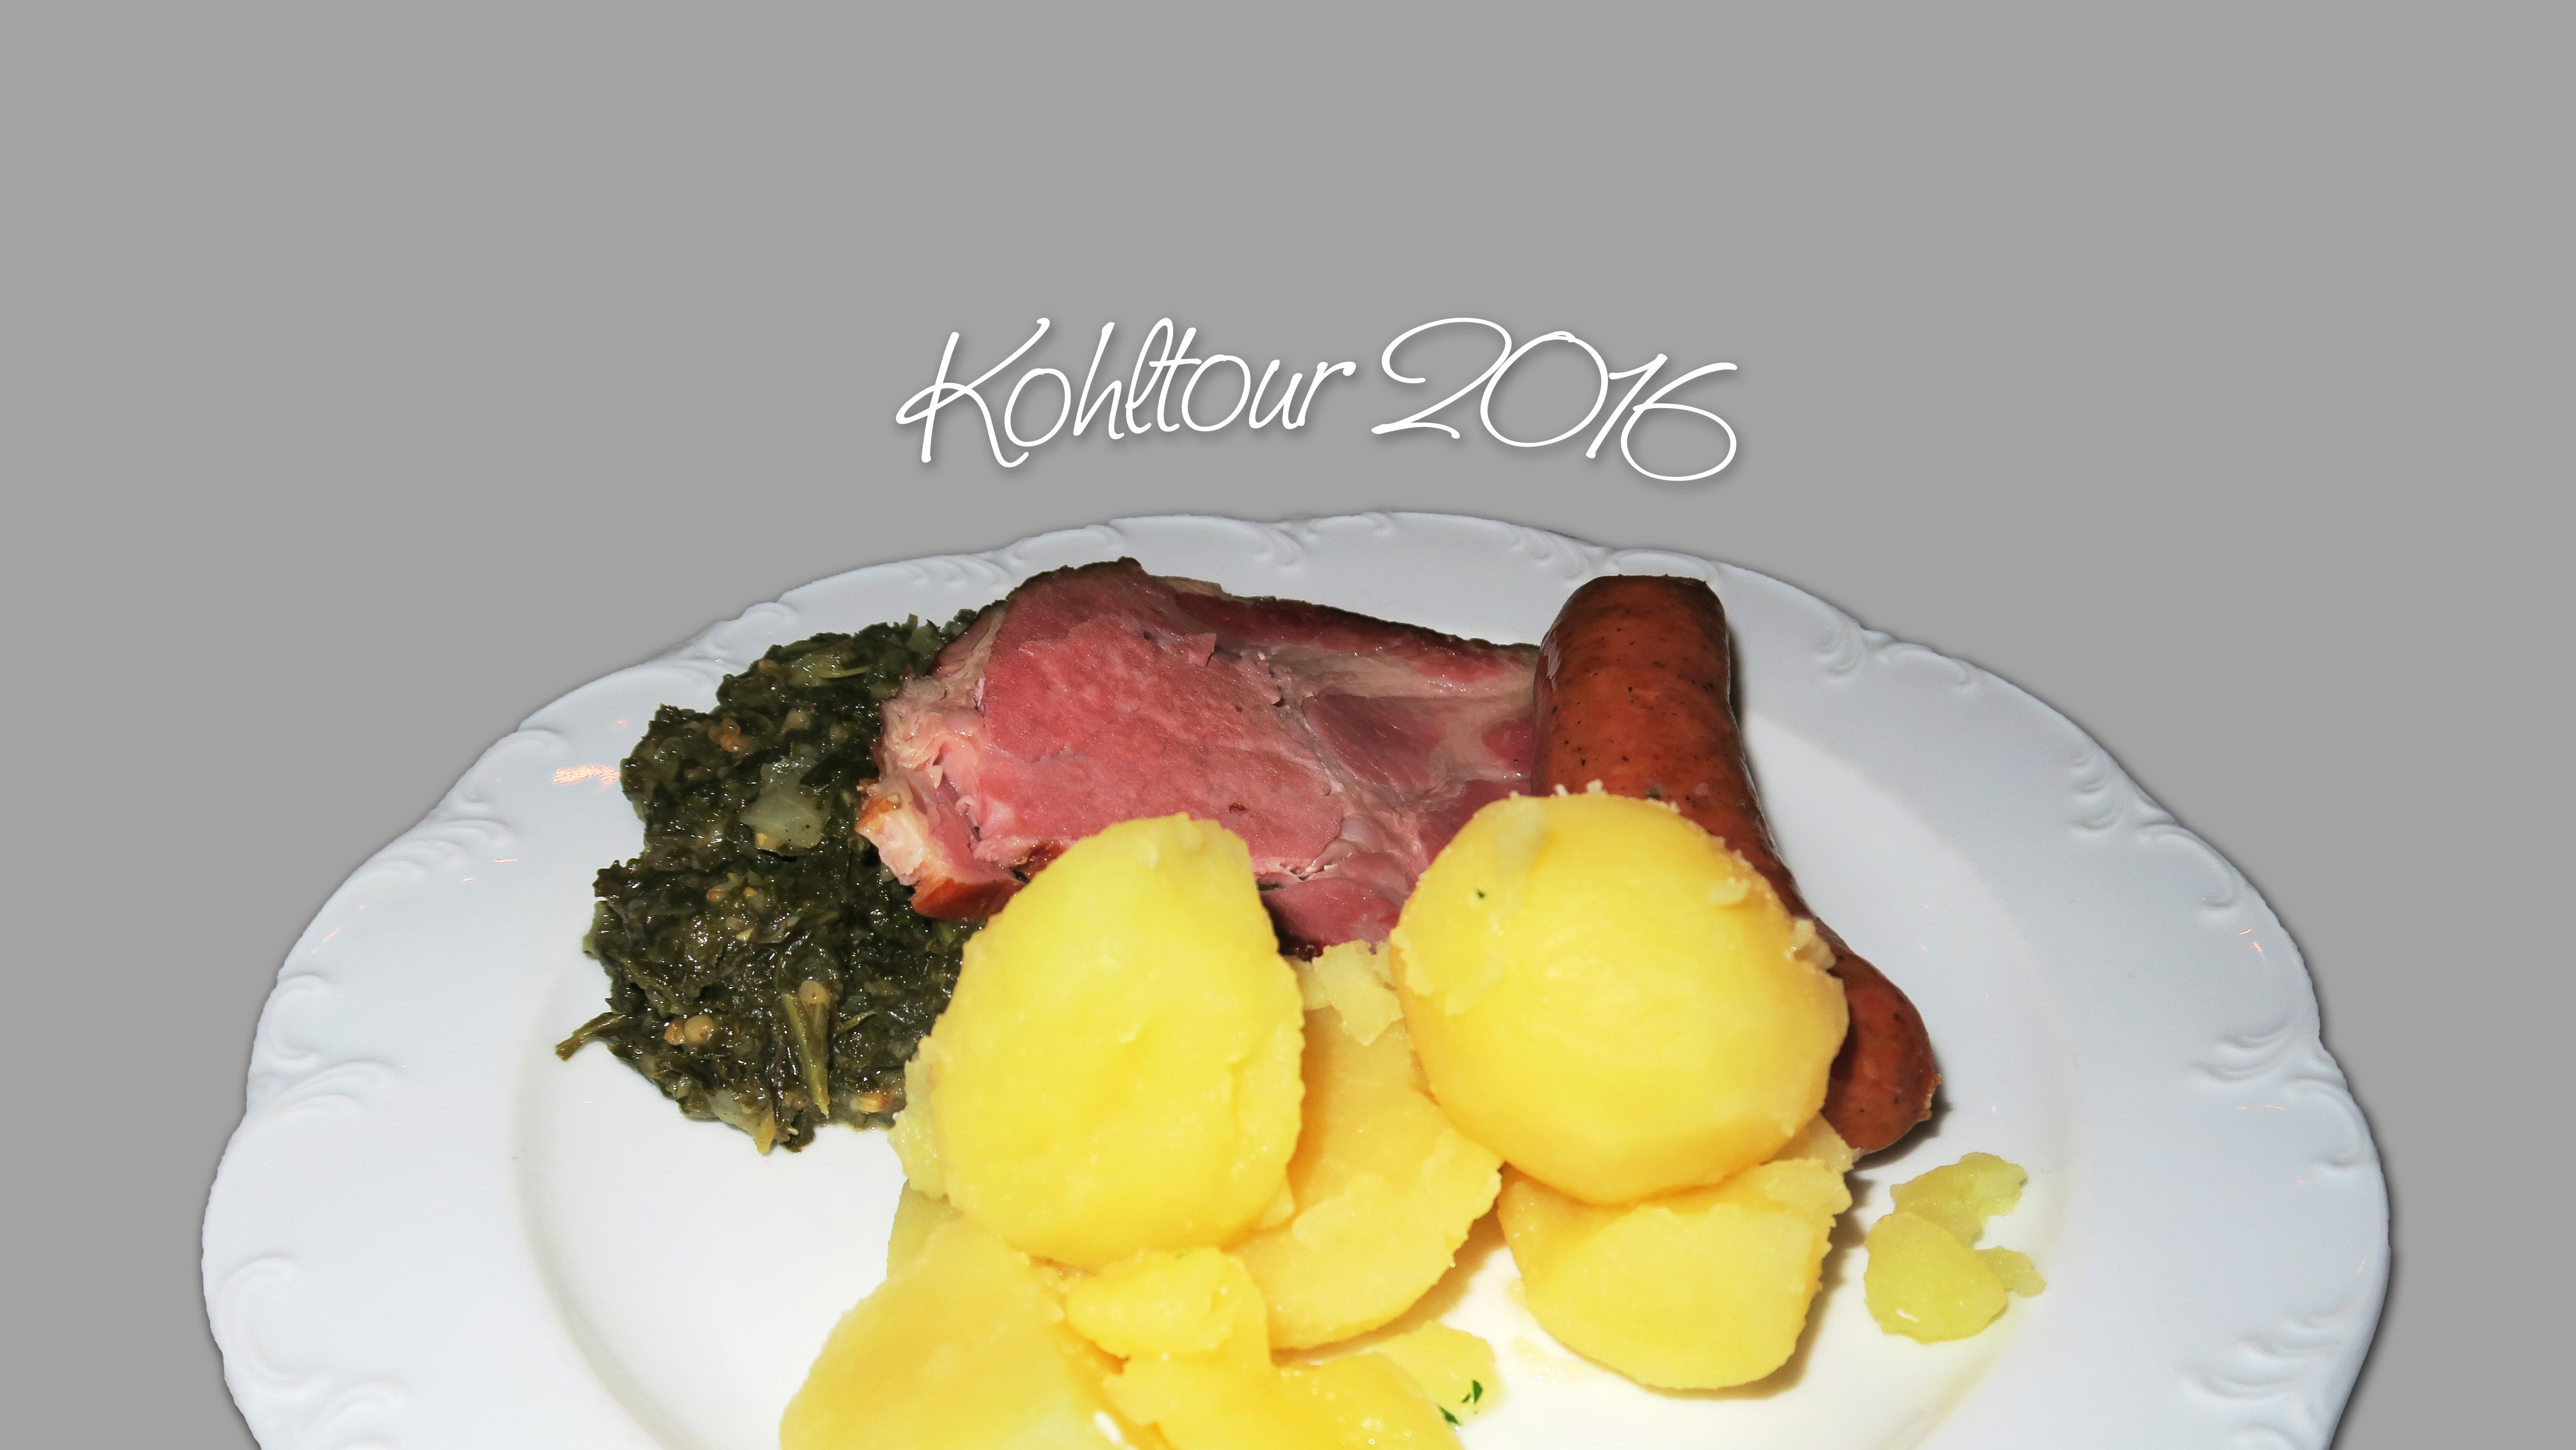 Kohltour 2016 Image